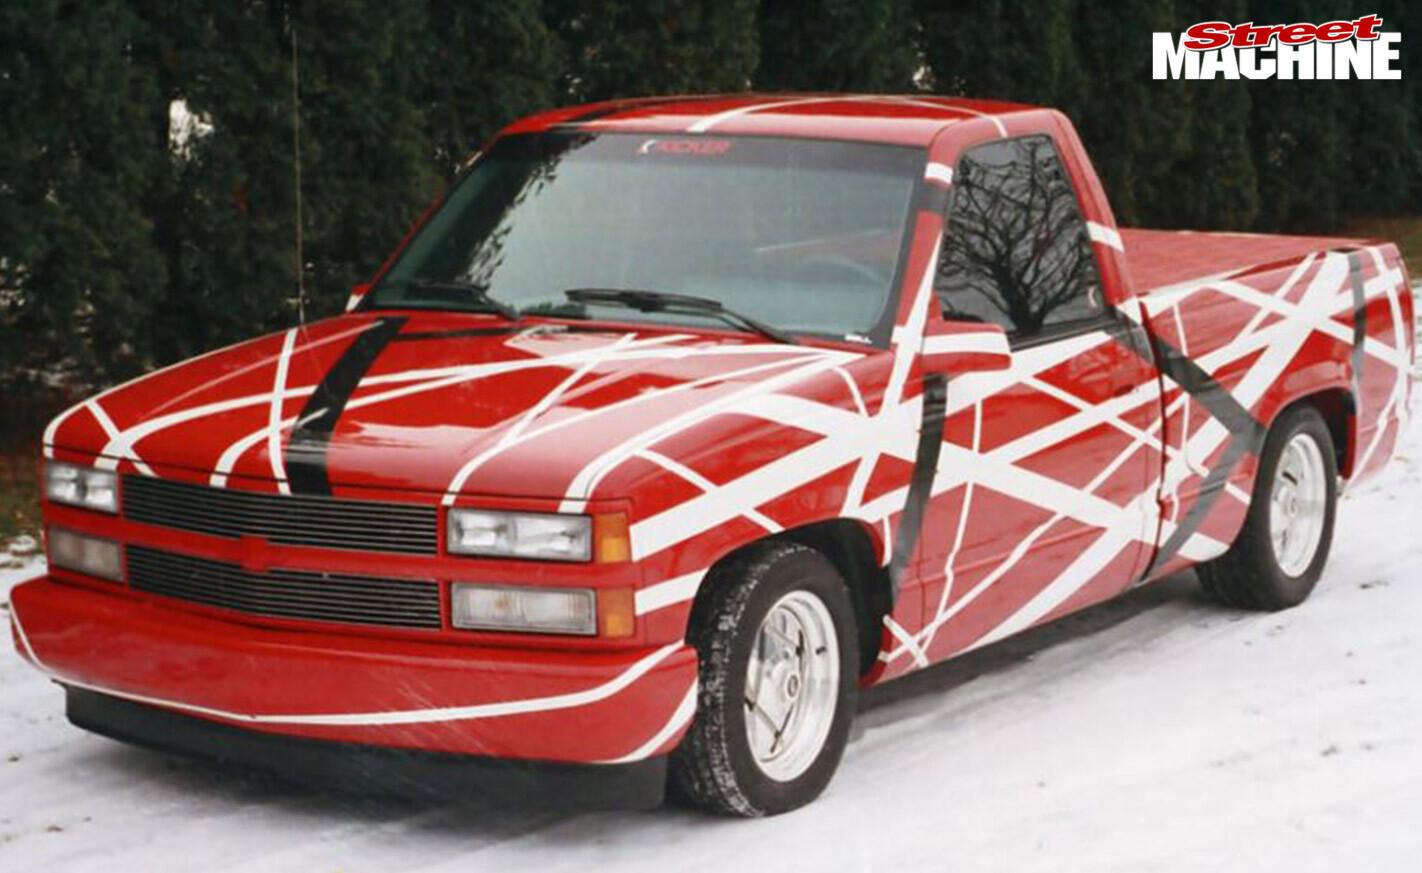 Eddie Van Halen's Chev 1500 pickup